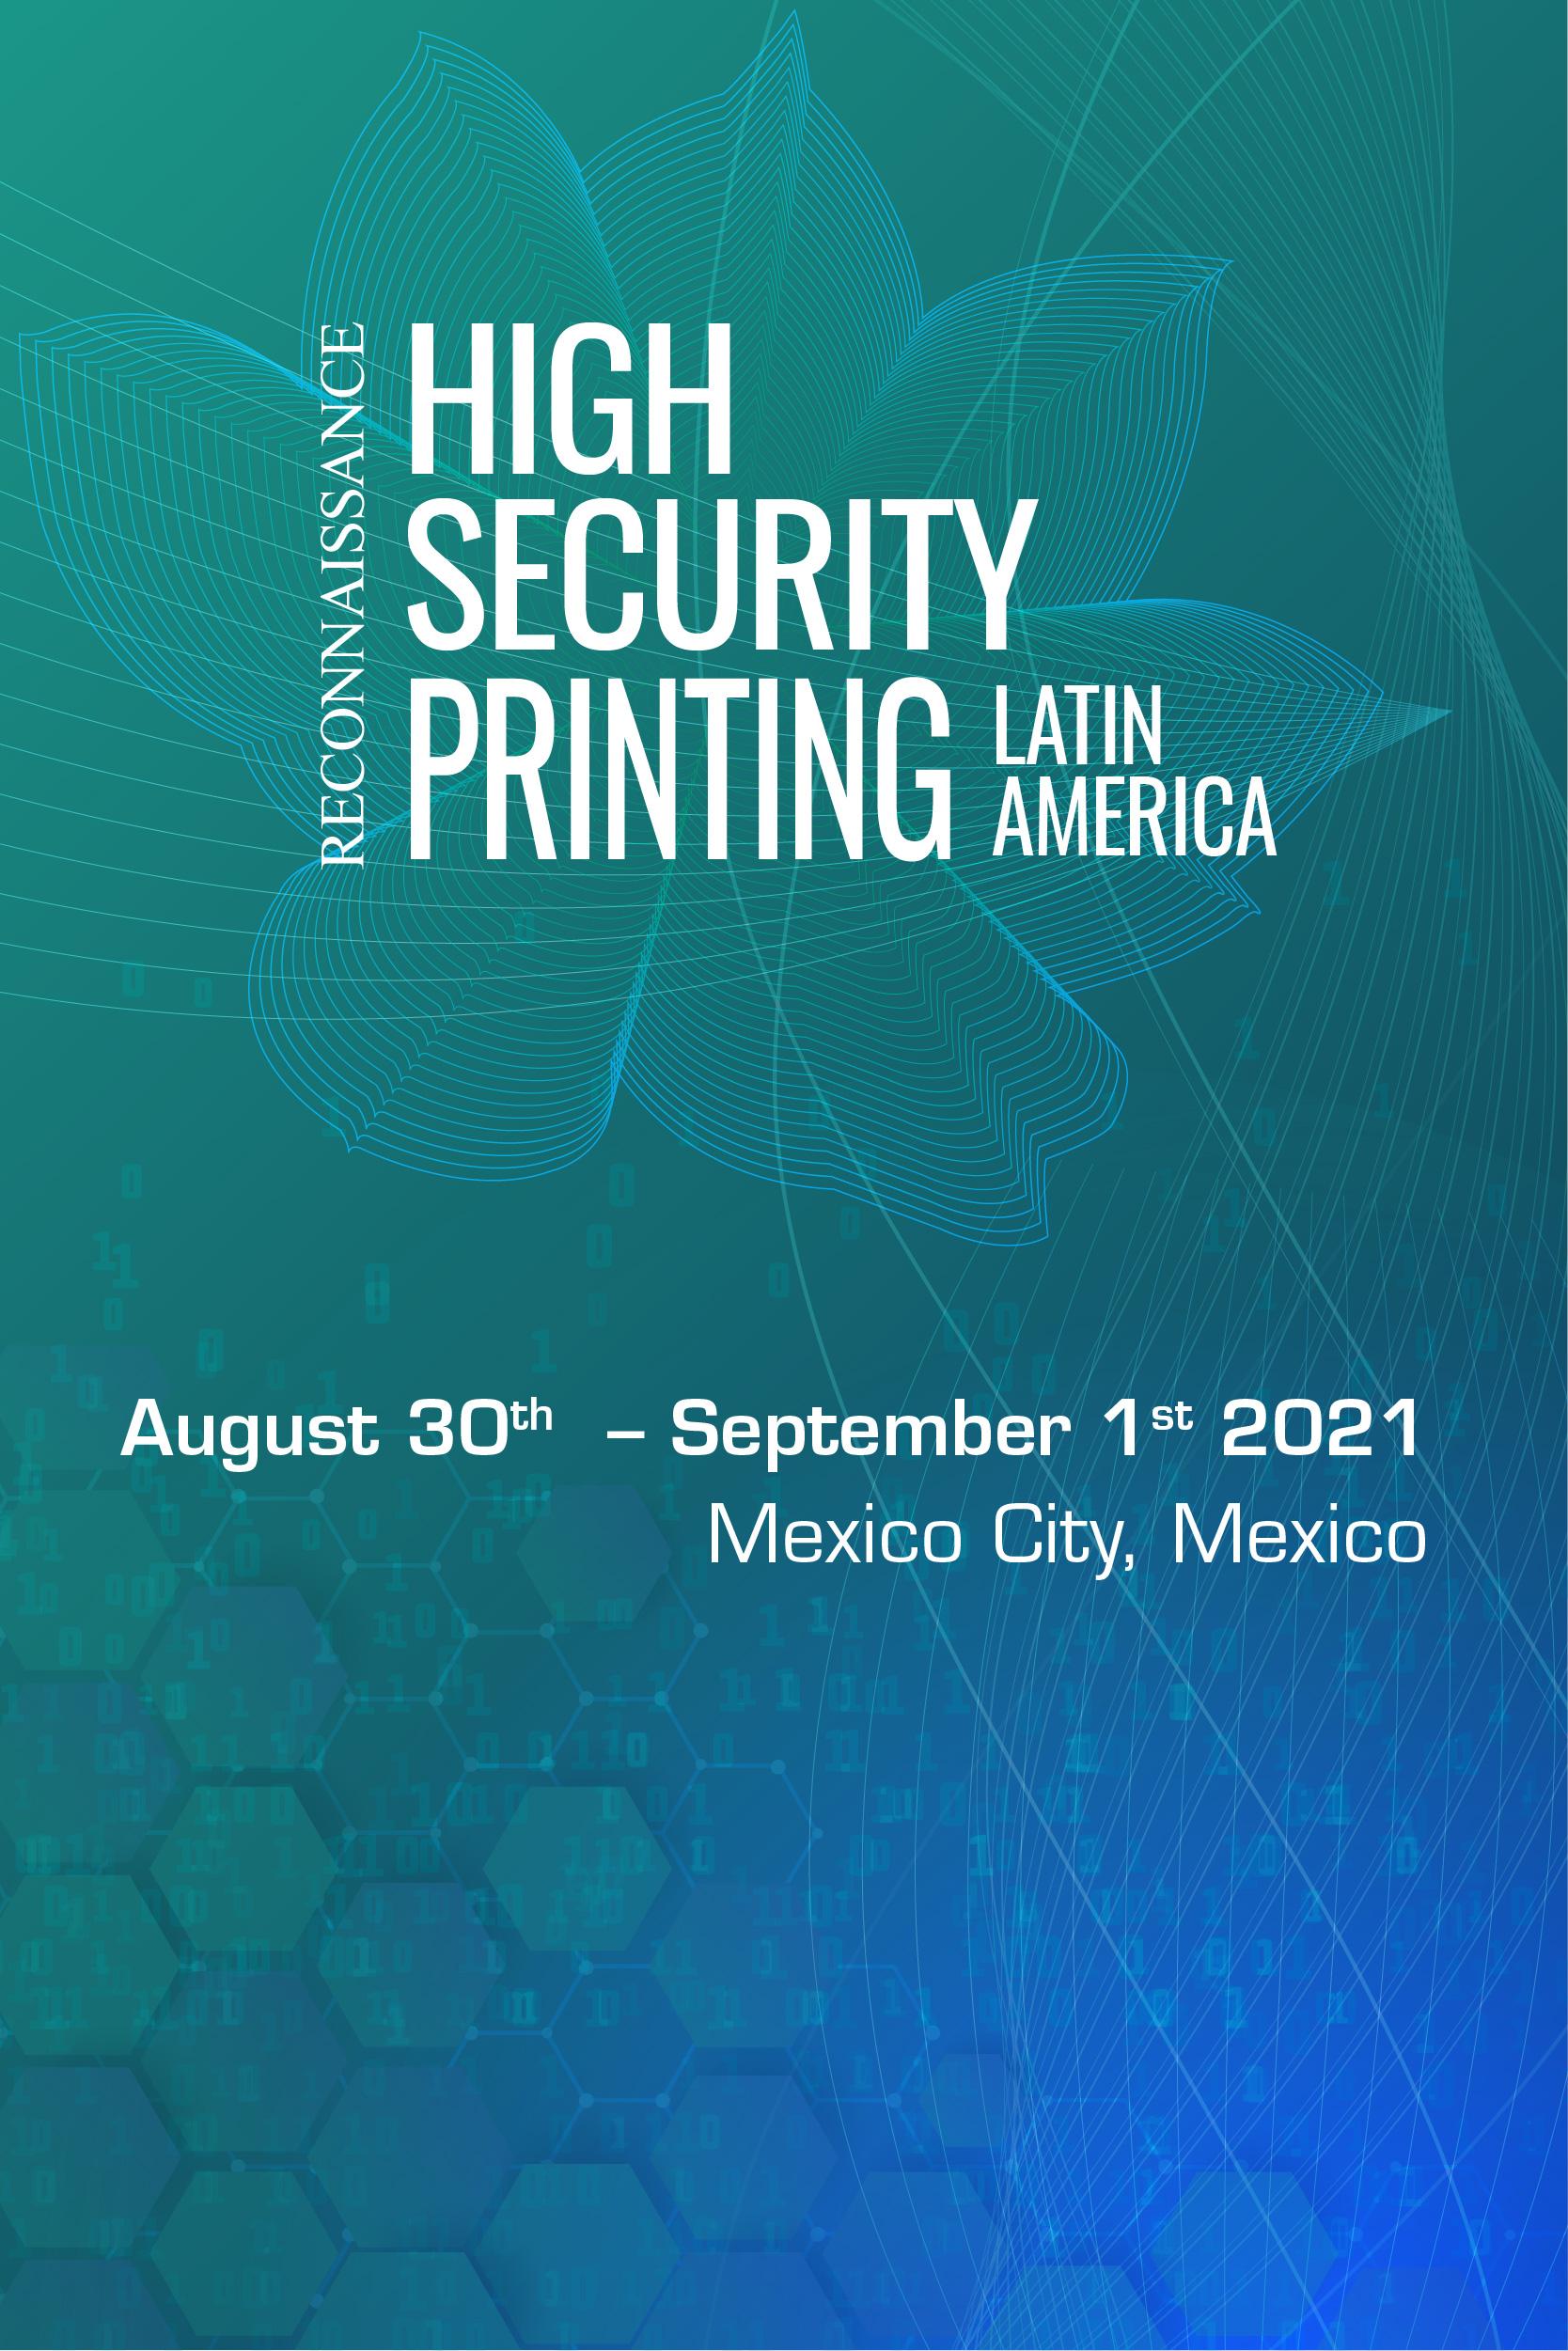 High Security Printing